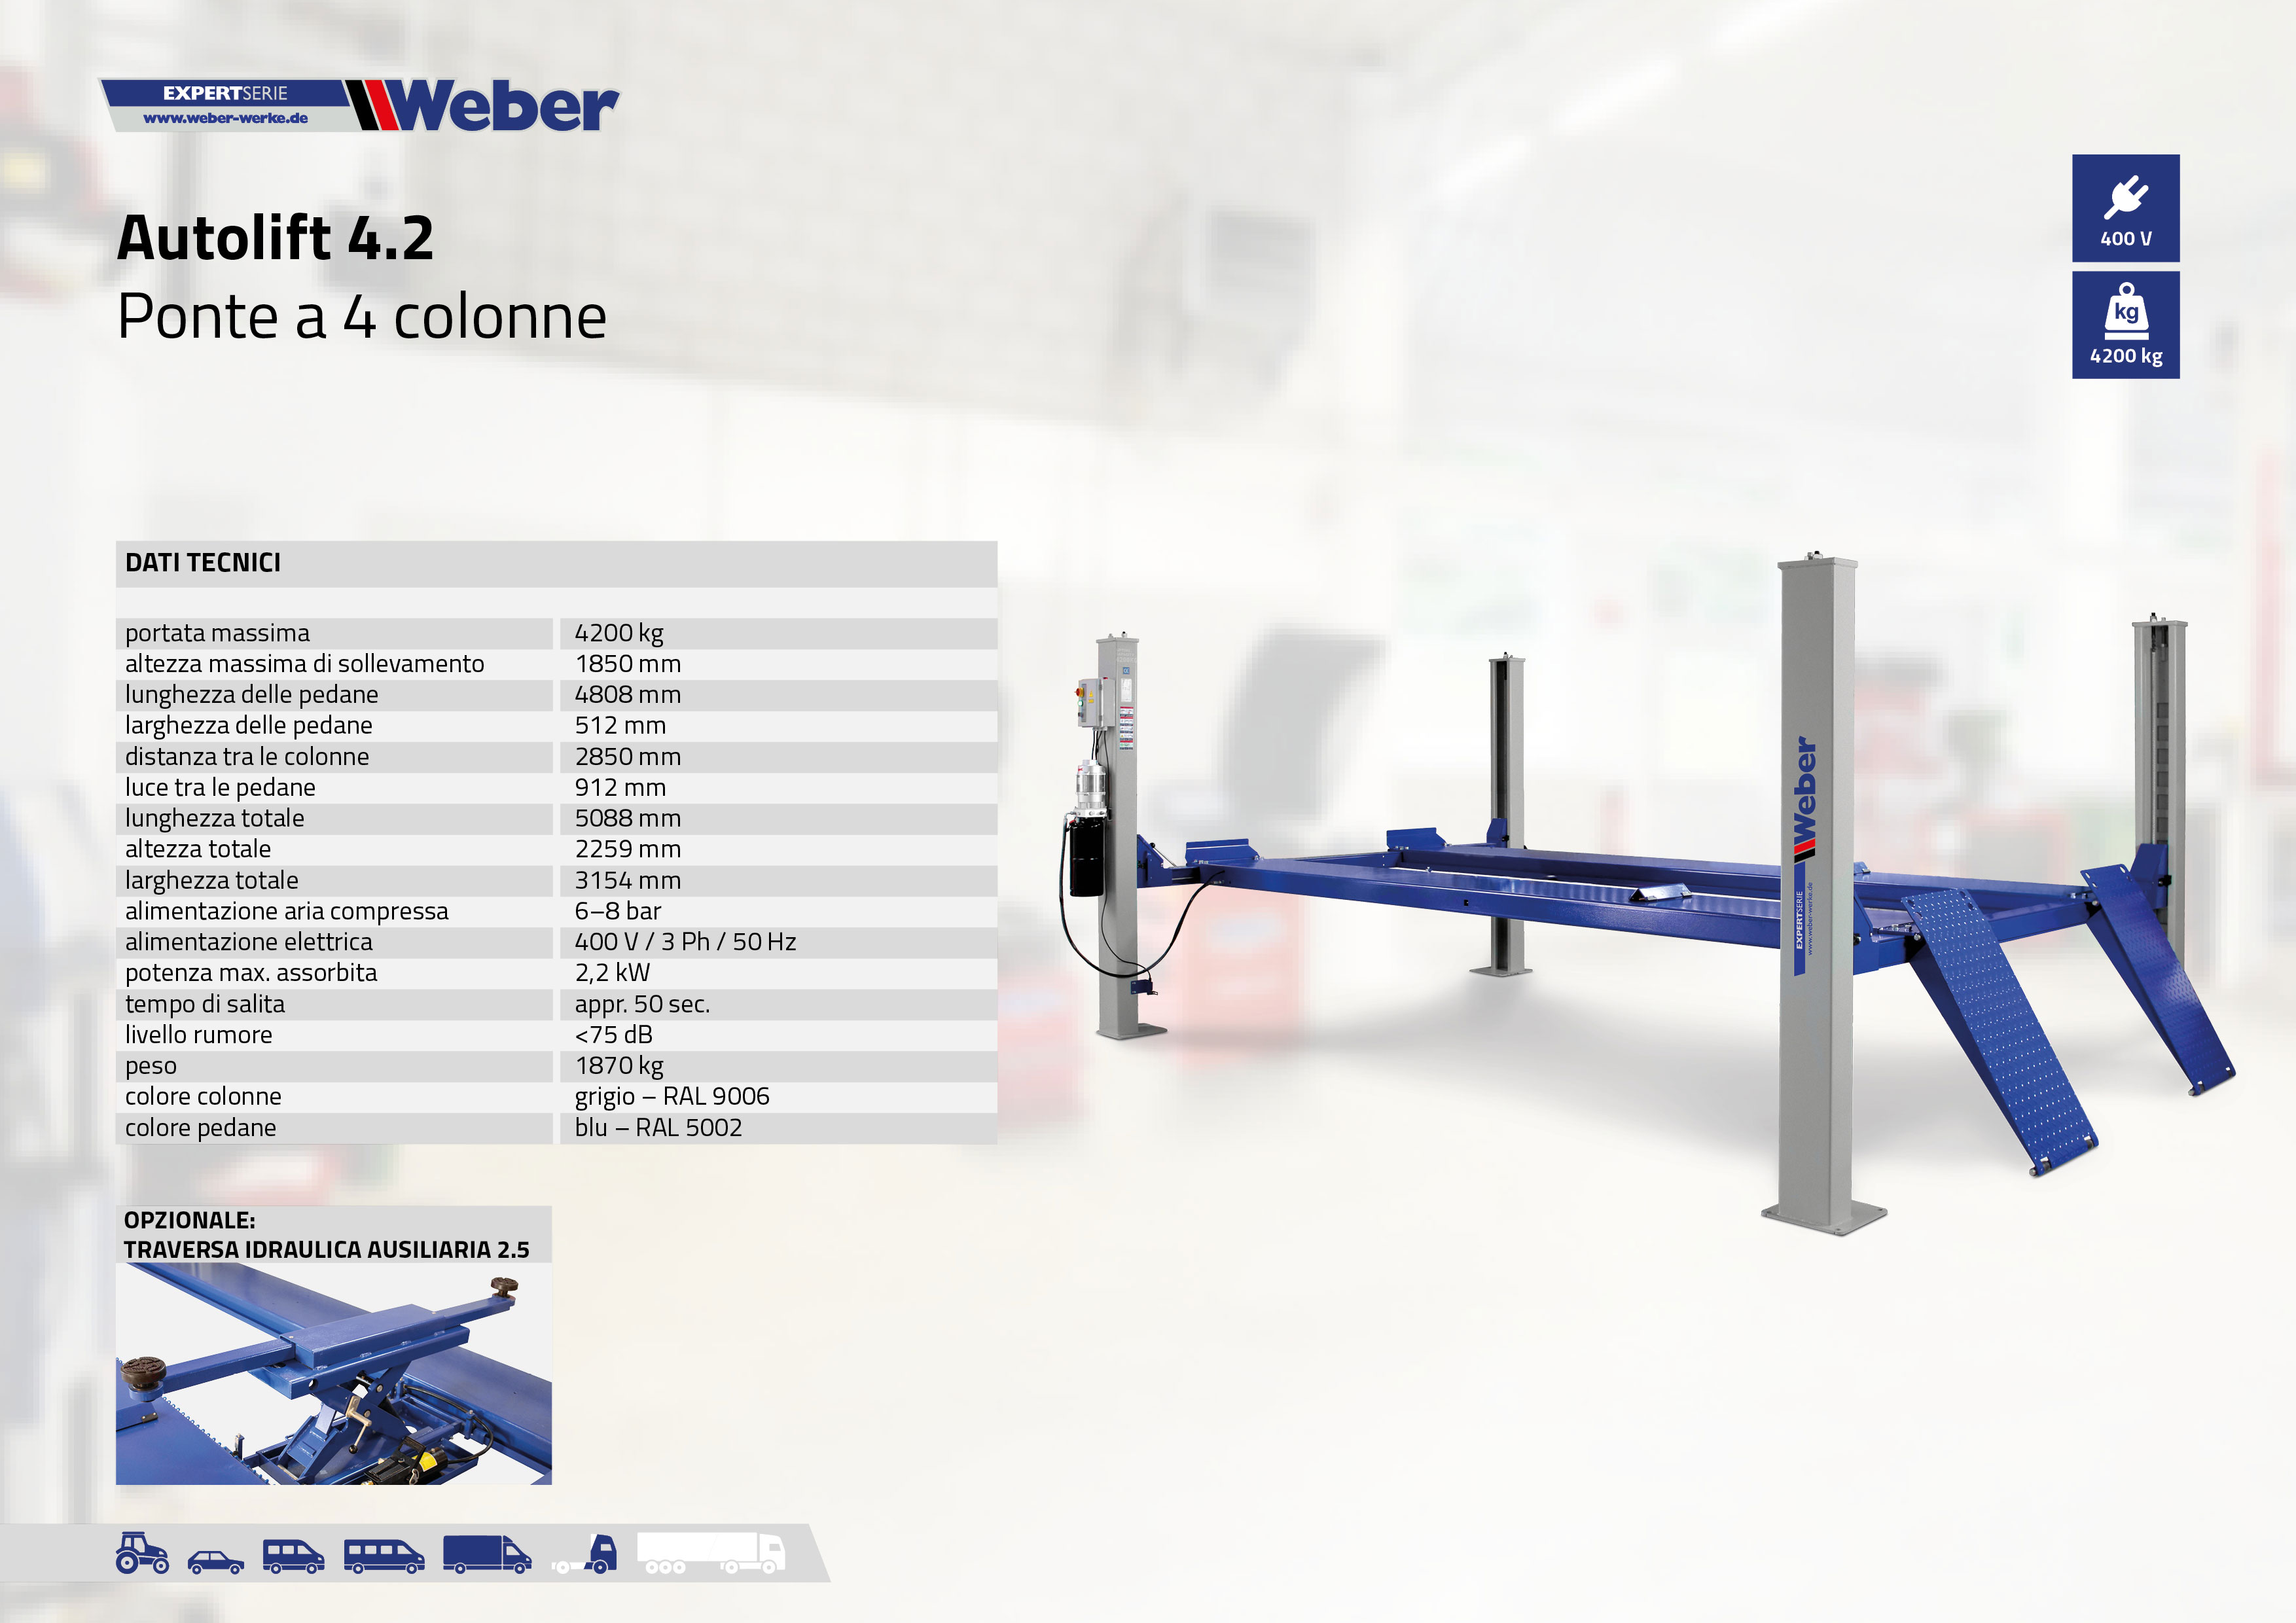 Ponte sollevatore a 4 colonne Weber Expert Serie Autolift 4.2